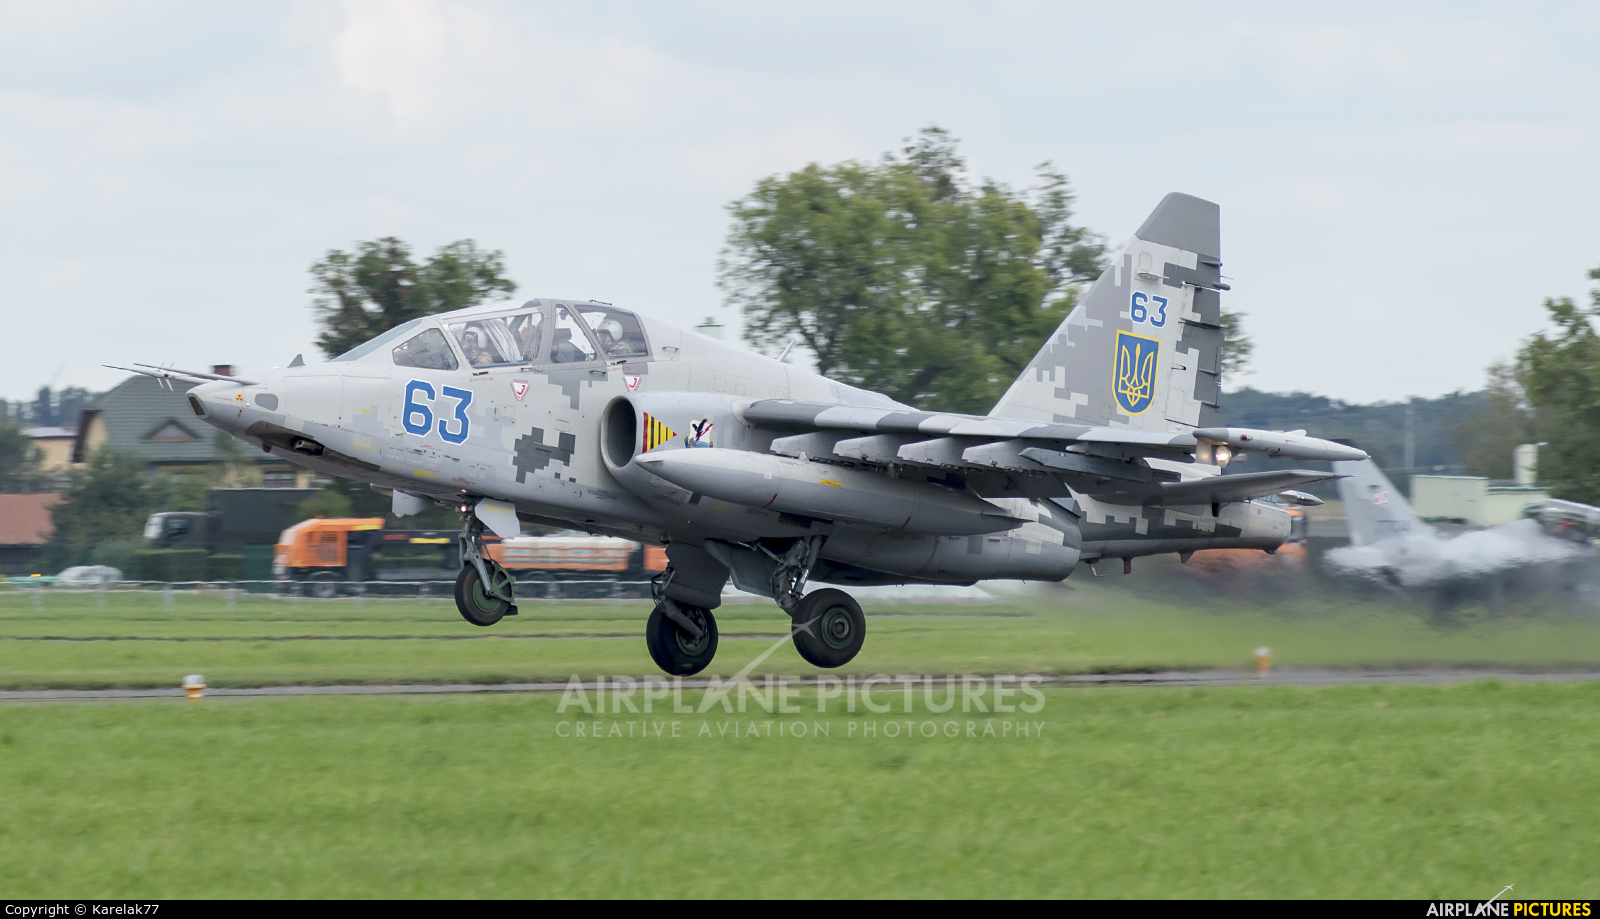 Ukraine - Air Force 63 aircraft at Radom - Sadków